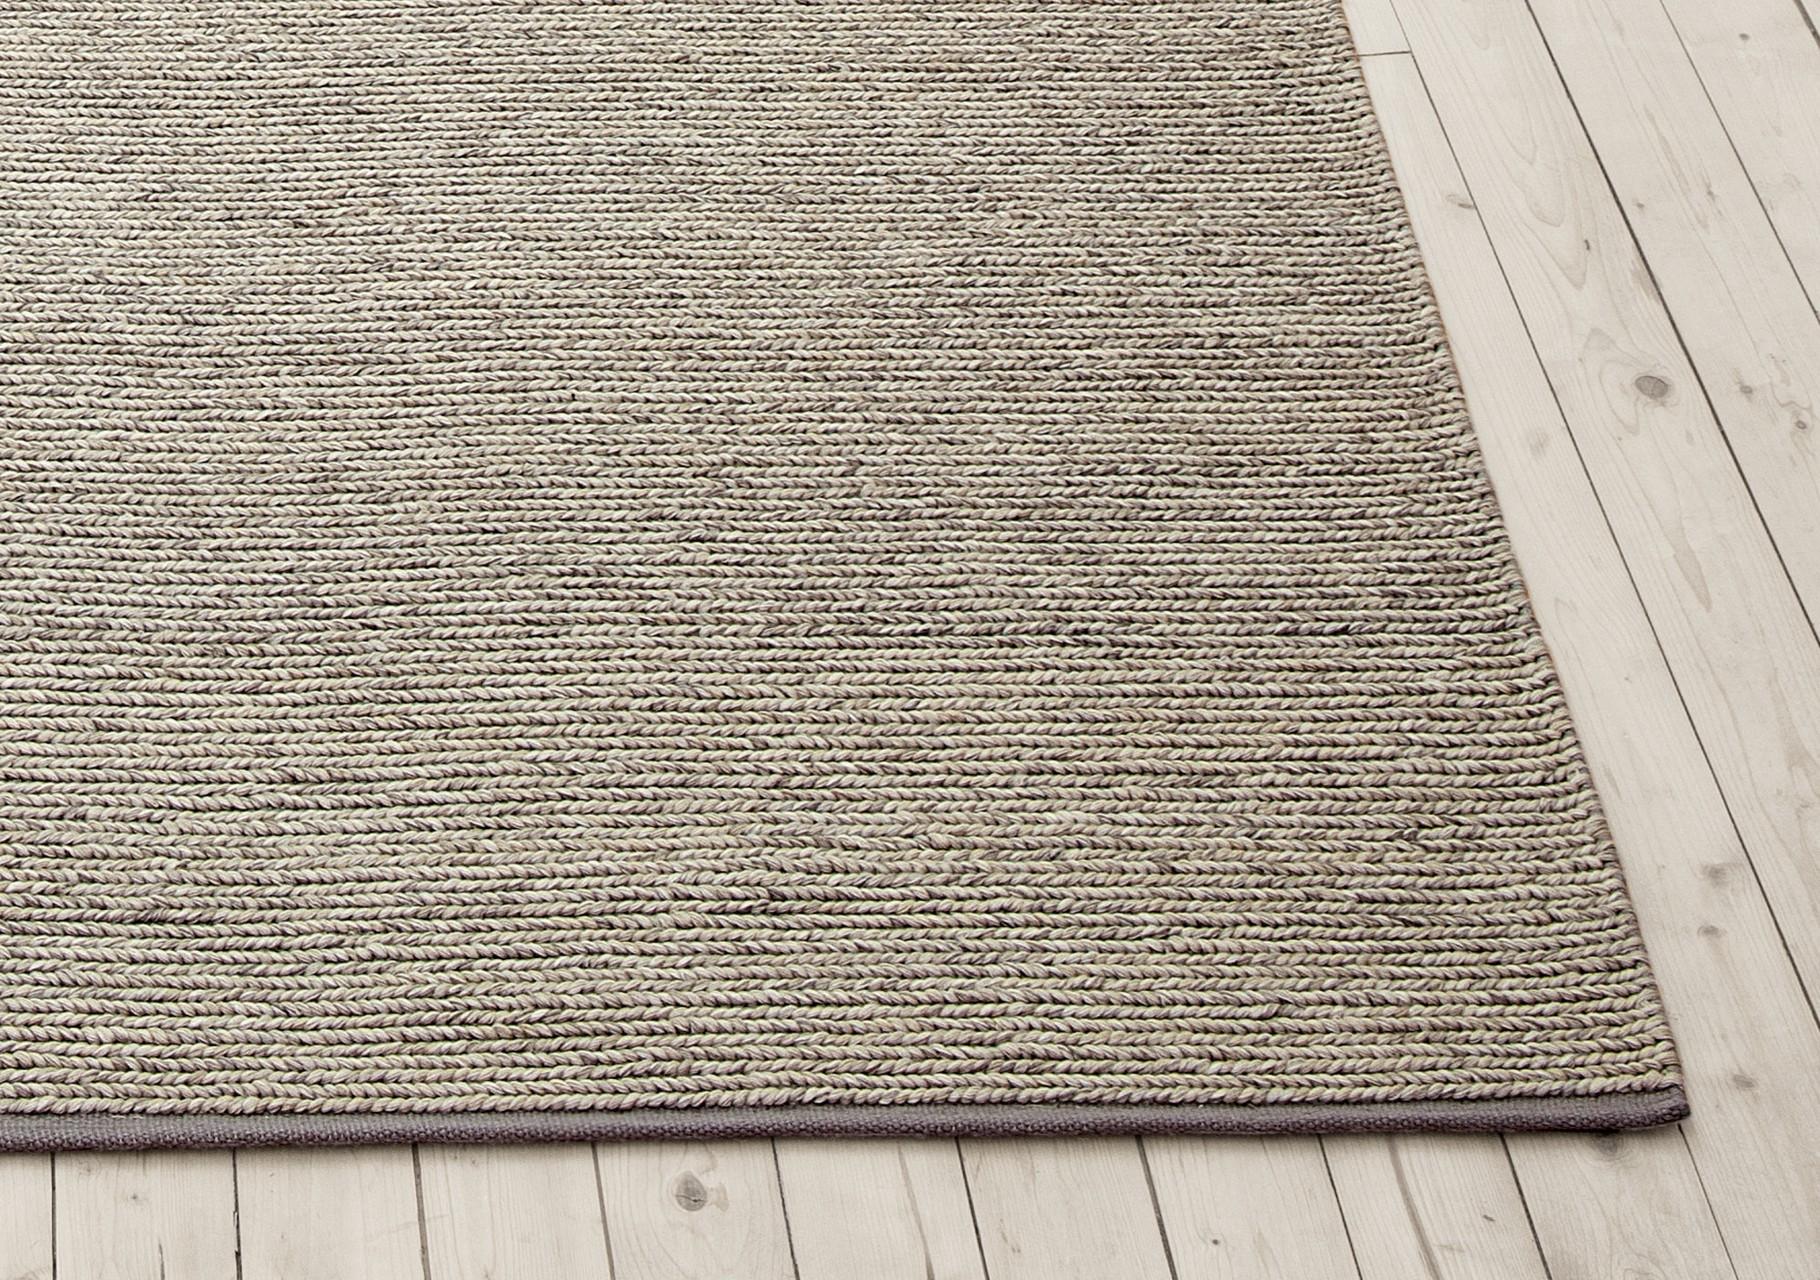 Teppiche Bohle Raum Trifft Ausstattung